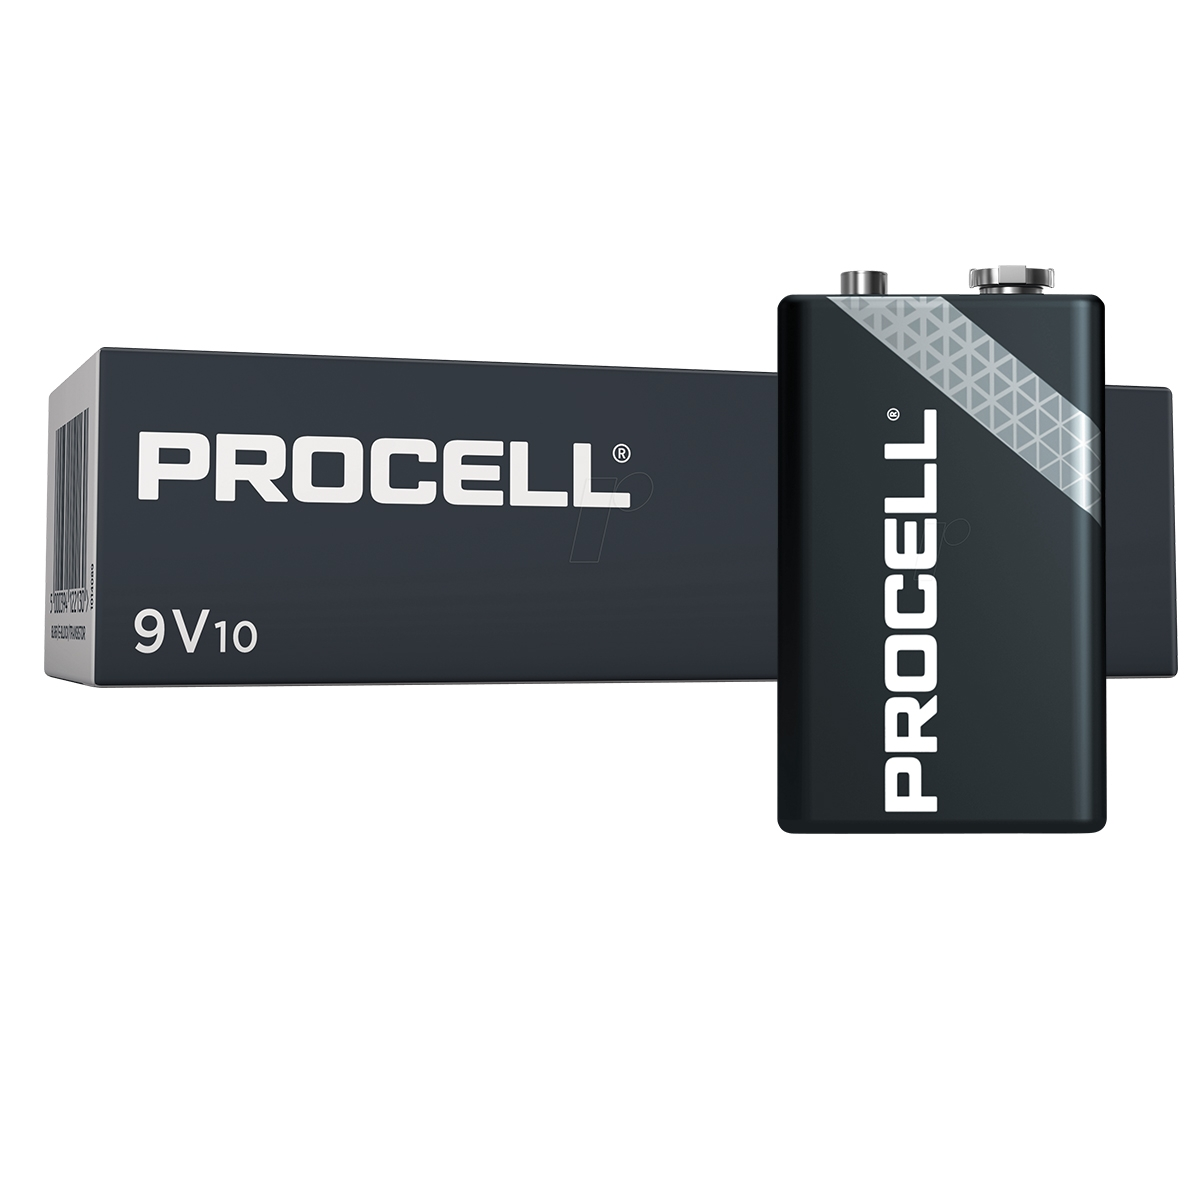 Duracell Procell 9V, doosje 10 stuks